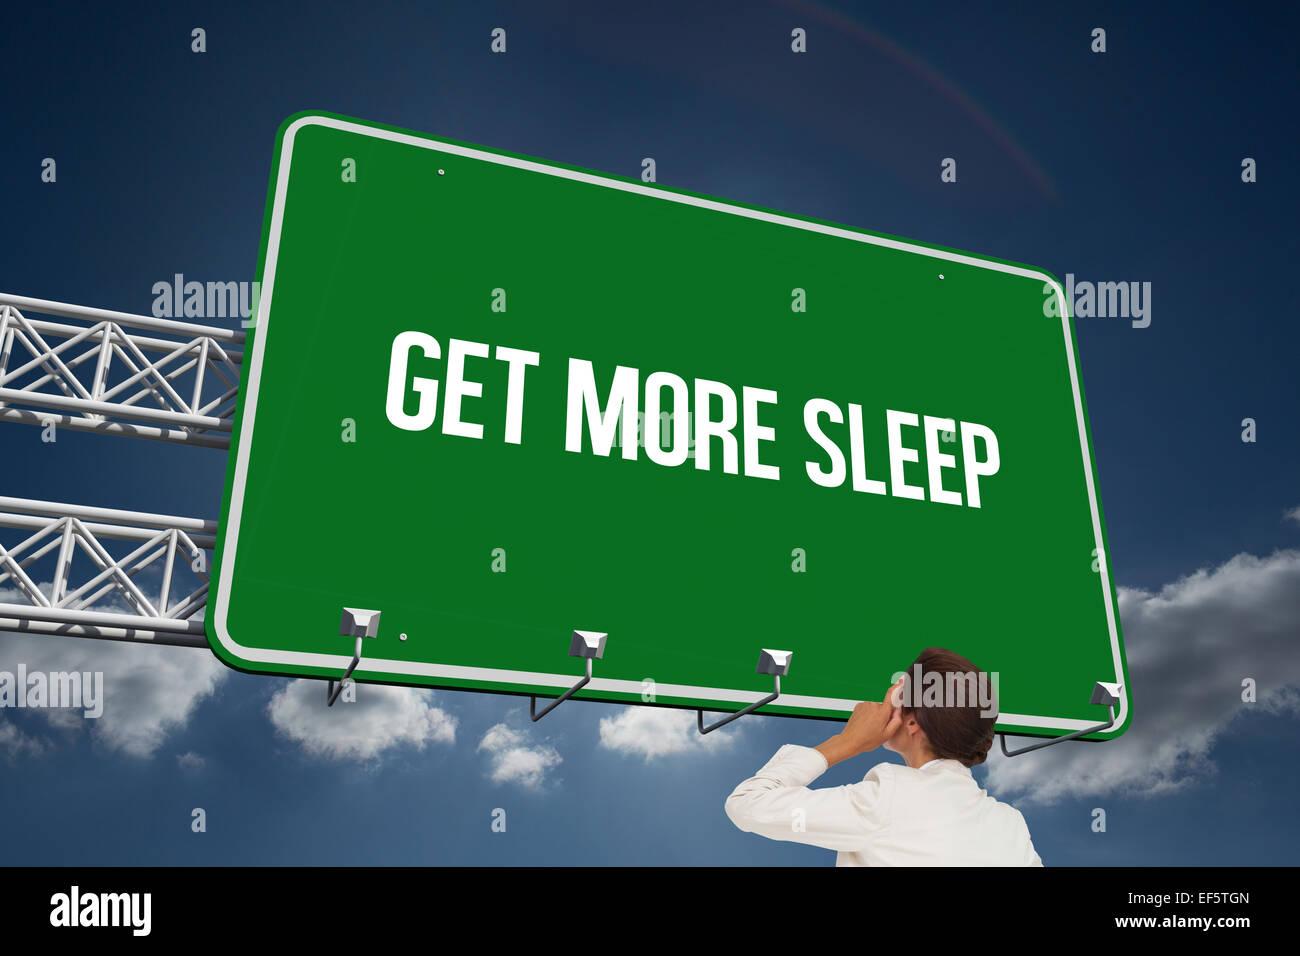 Get more sleep against sky - Stock Image